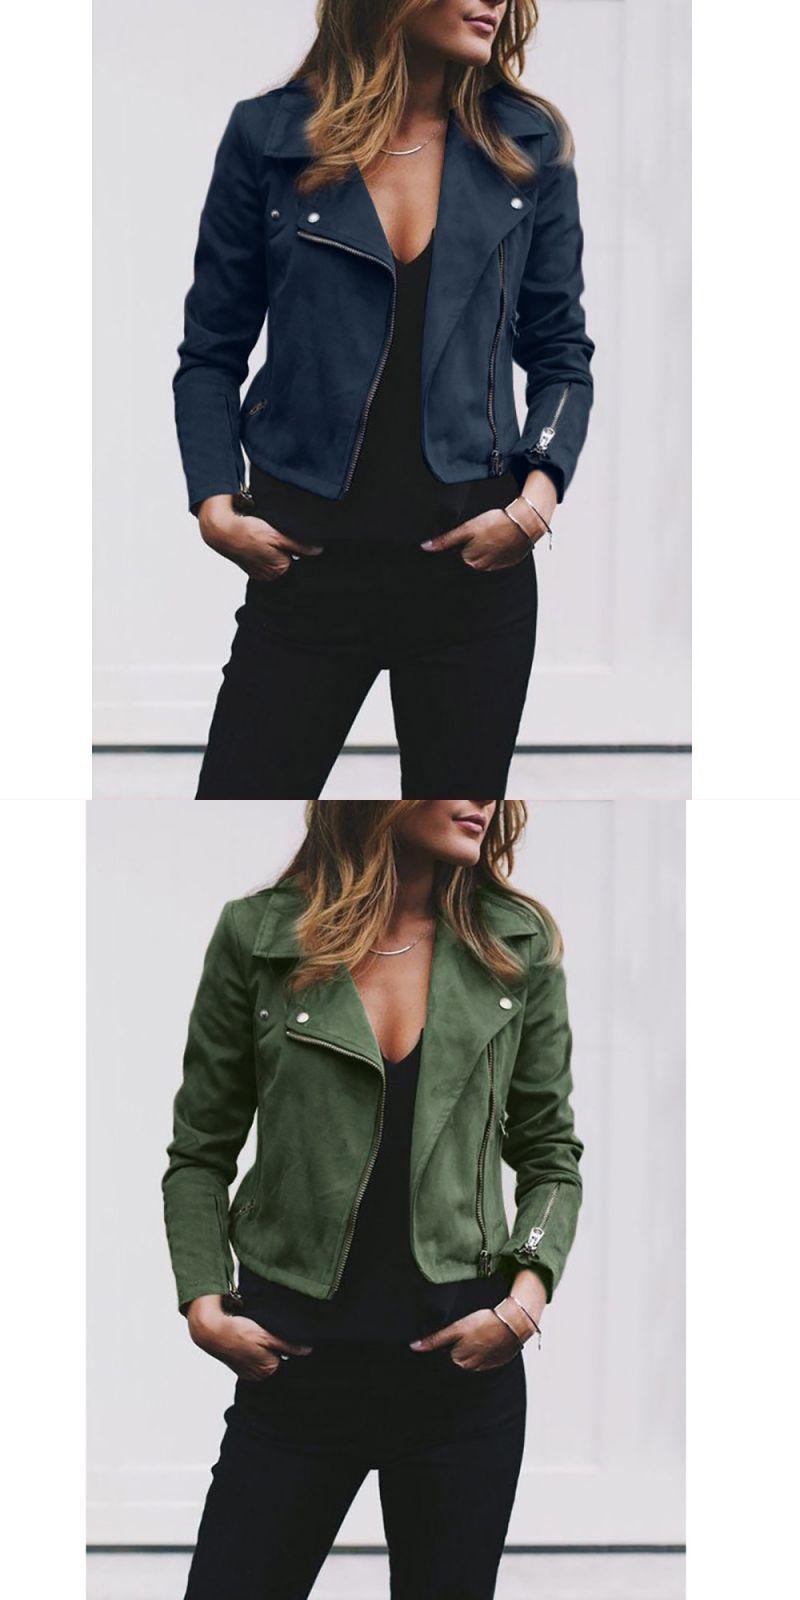 Womens Ladies Retro Rivet Zipper Solid Slim Turn Down Collar Up Bomber Jacket Casual Coat Outwear Polyester Casual Z Casual Coat Coats Jackets Women Outwear [ 1600 x 800 Pixel ]